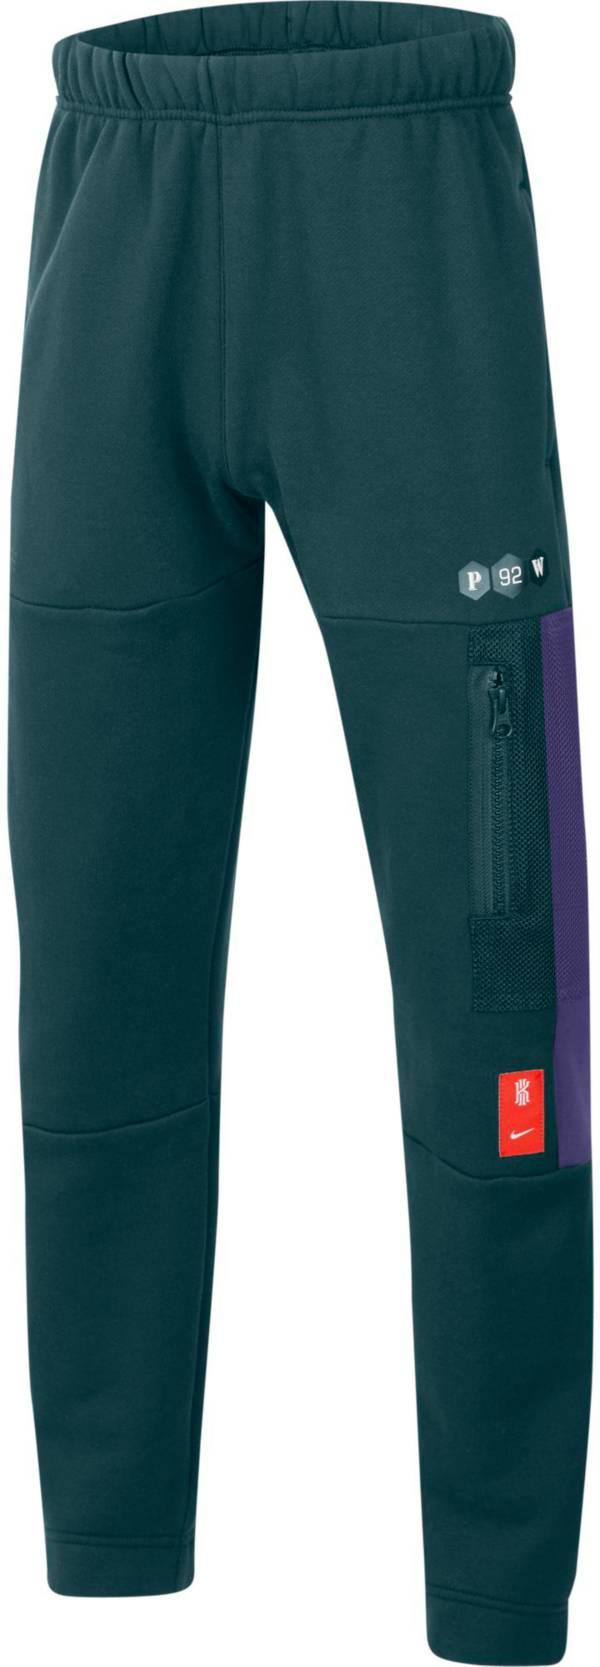 Nike Boys' Kyrie Jogger Pants product image